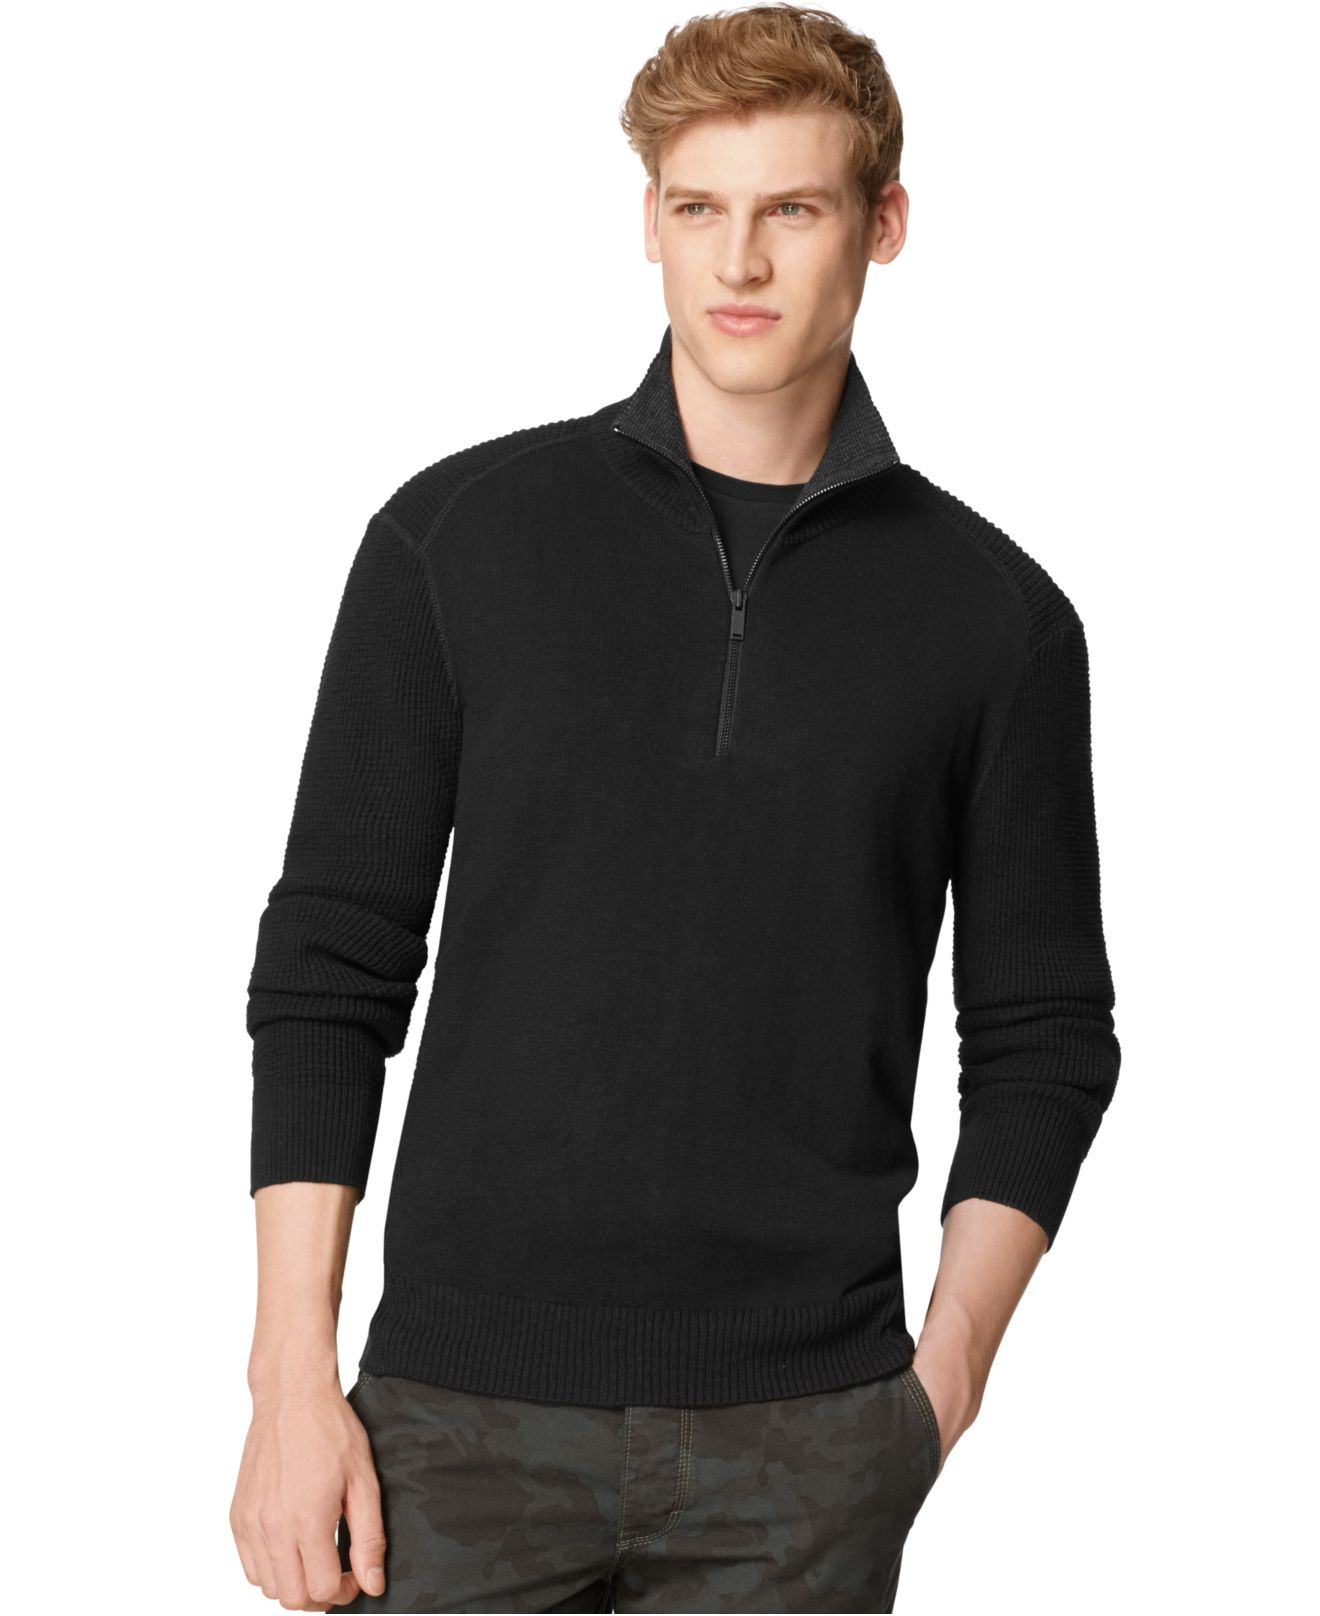 lyst calvin klein jeans textured zip sweater in blue for men. Black Bedroom Furniture Sets. Home Design Ideas